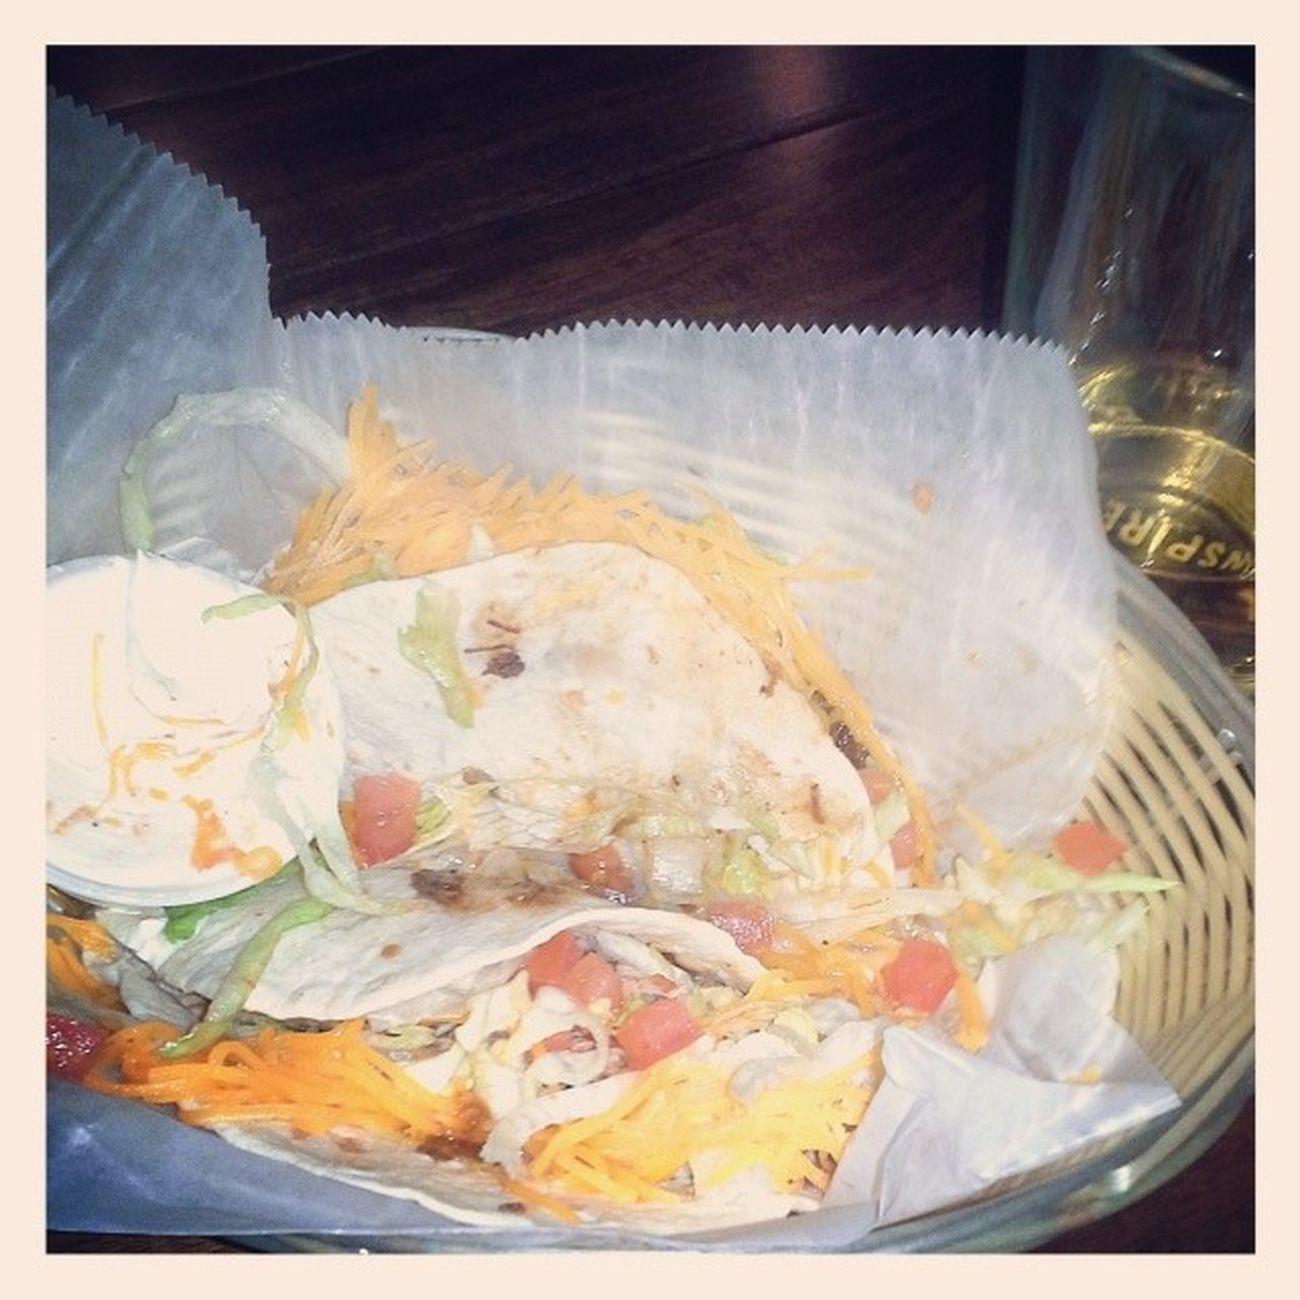 Yummy duck tacos!